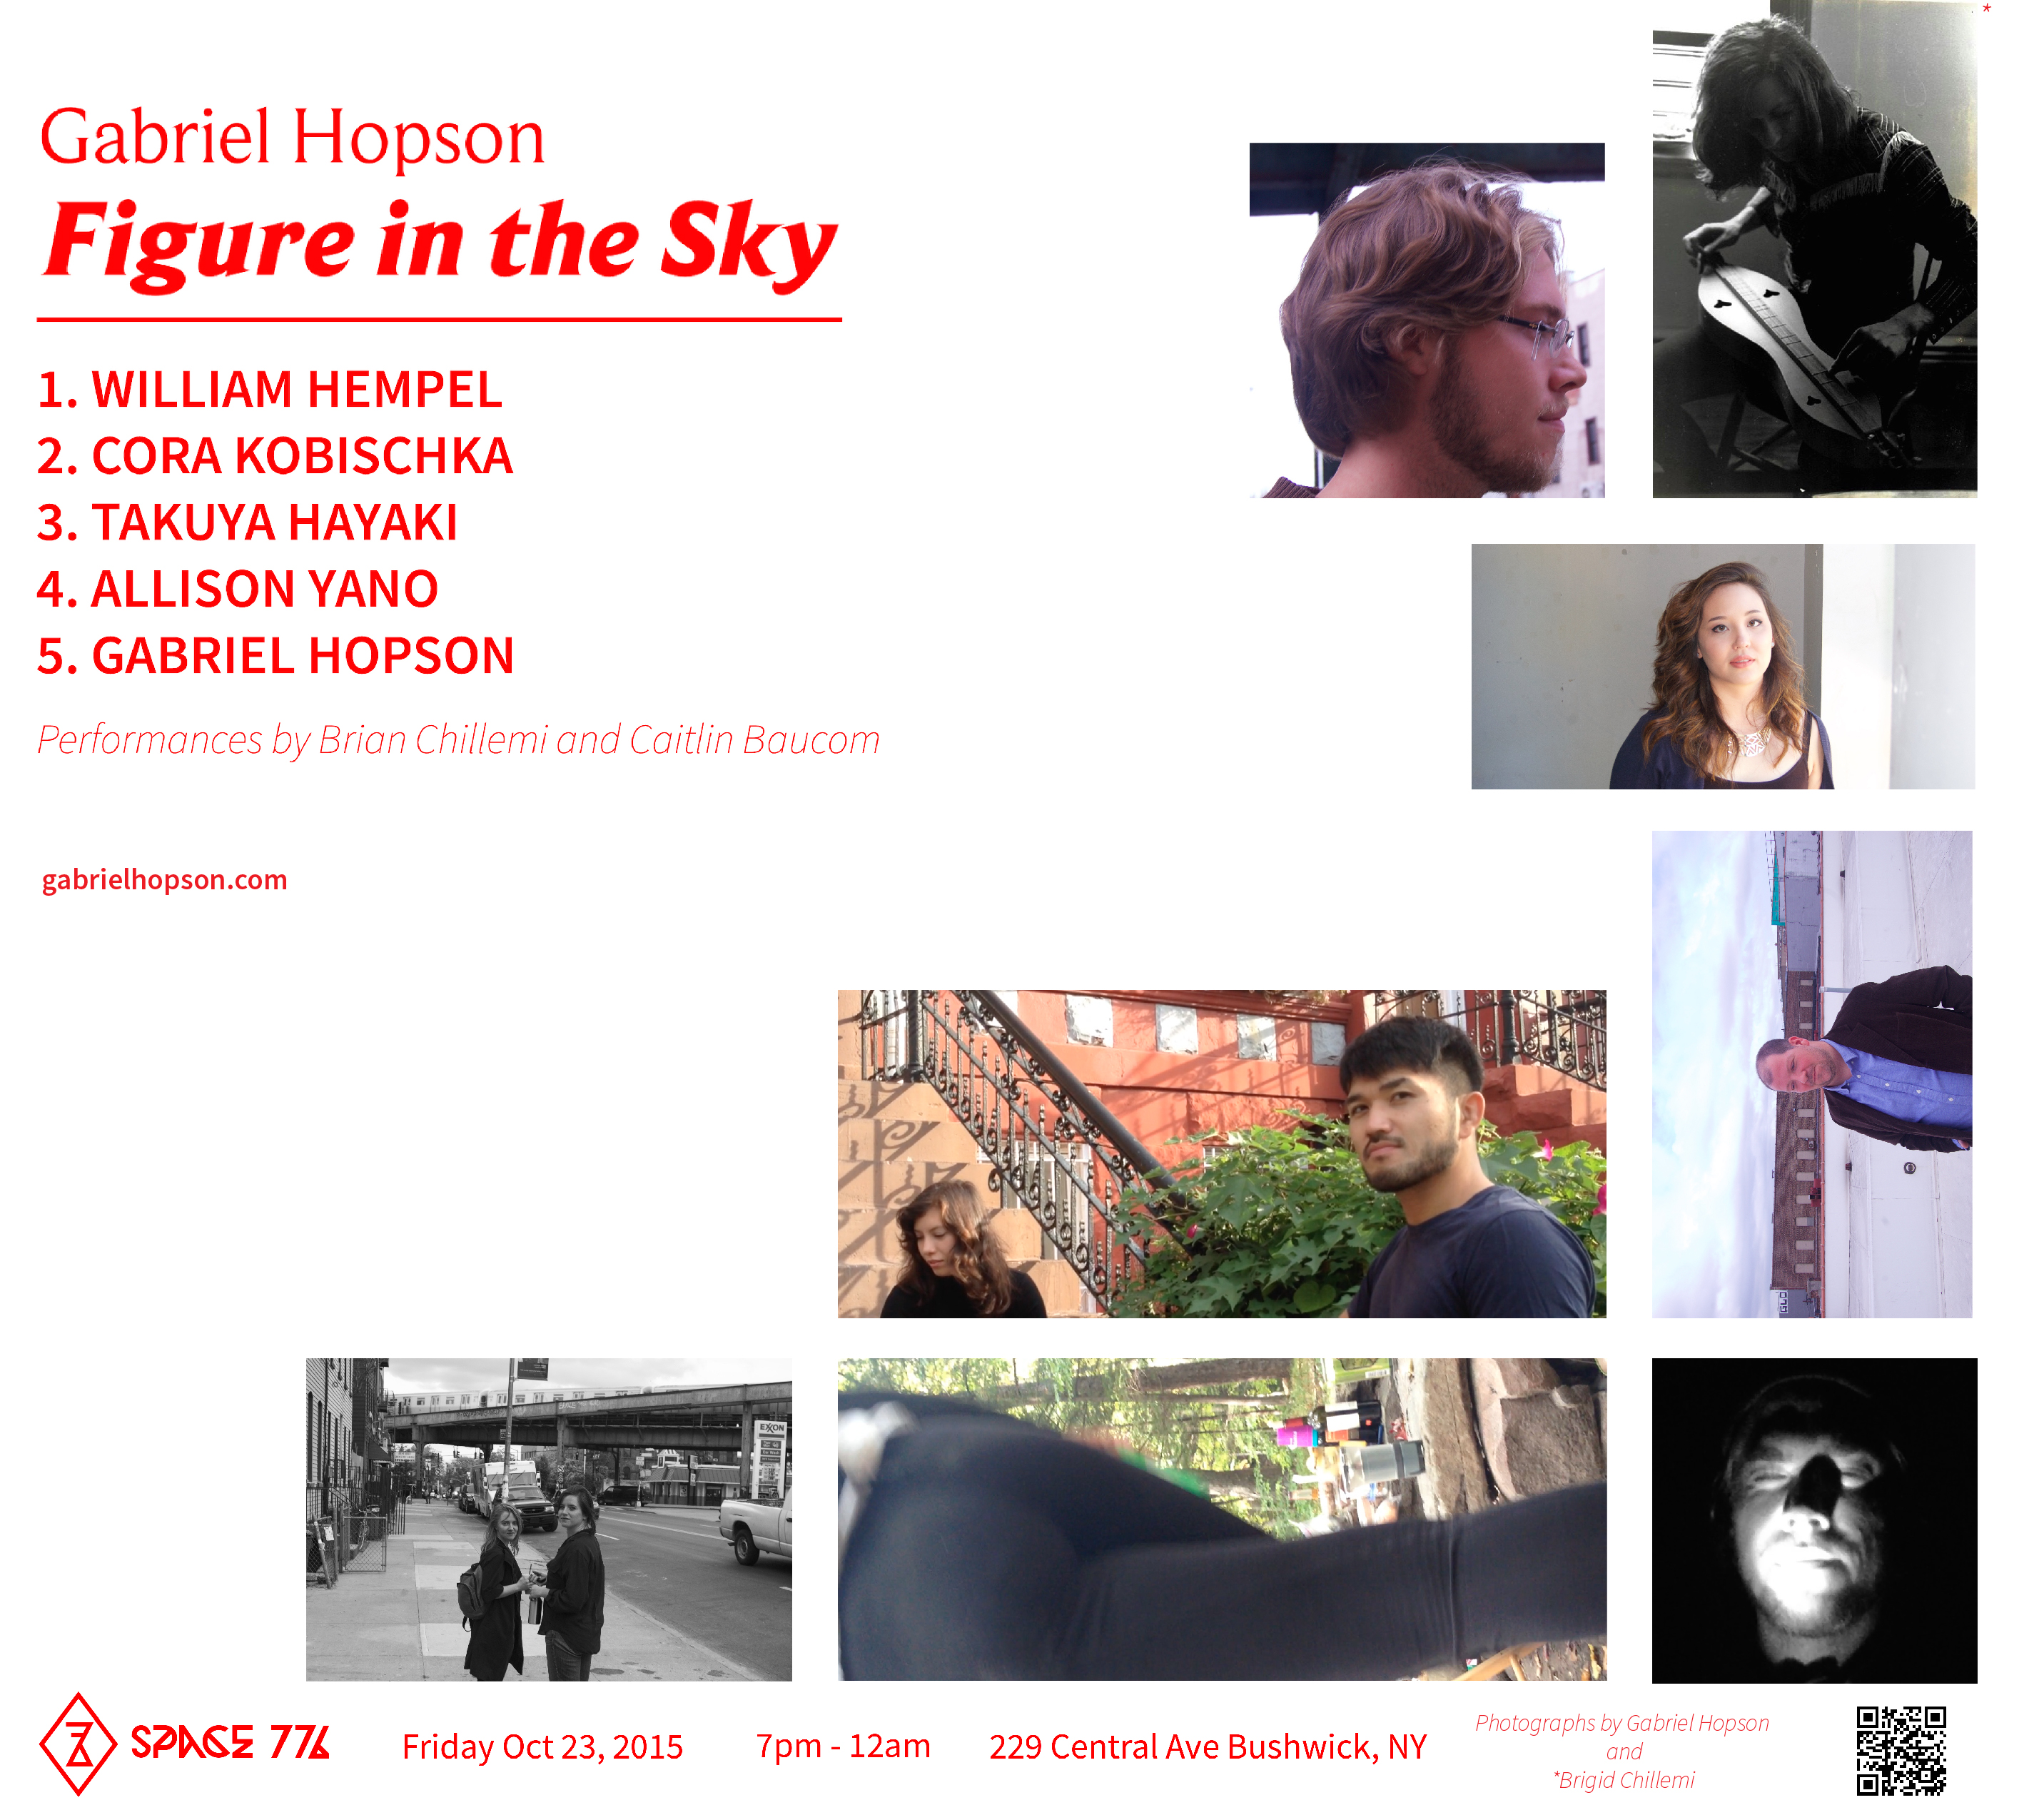 Figure in the sky